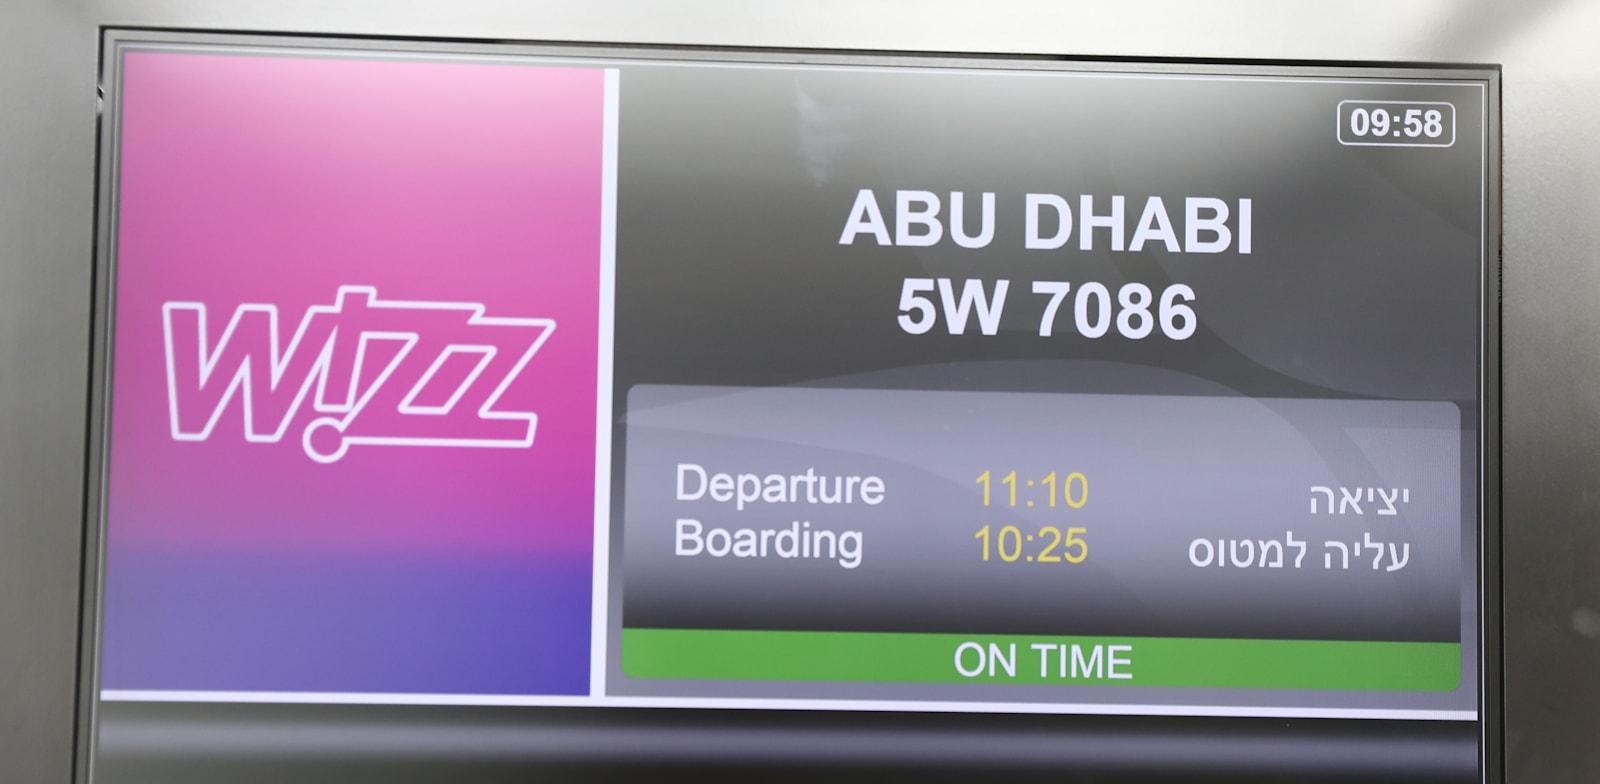 Wizz Air Tel Aviv - Abu Dhabi Credit: PR Yossi Aloni